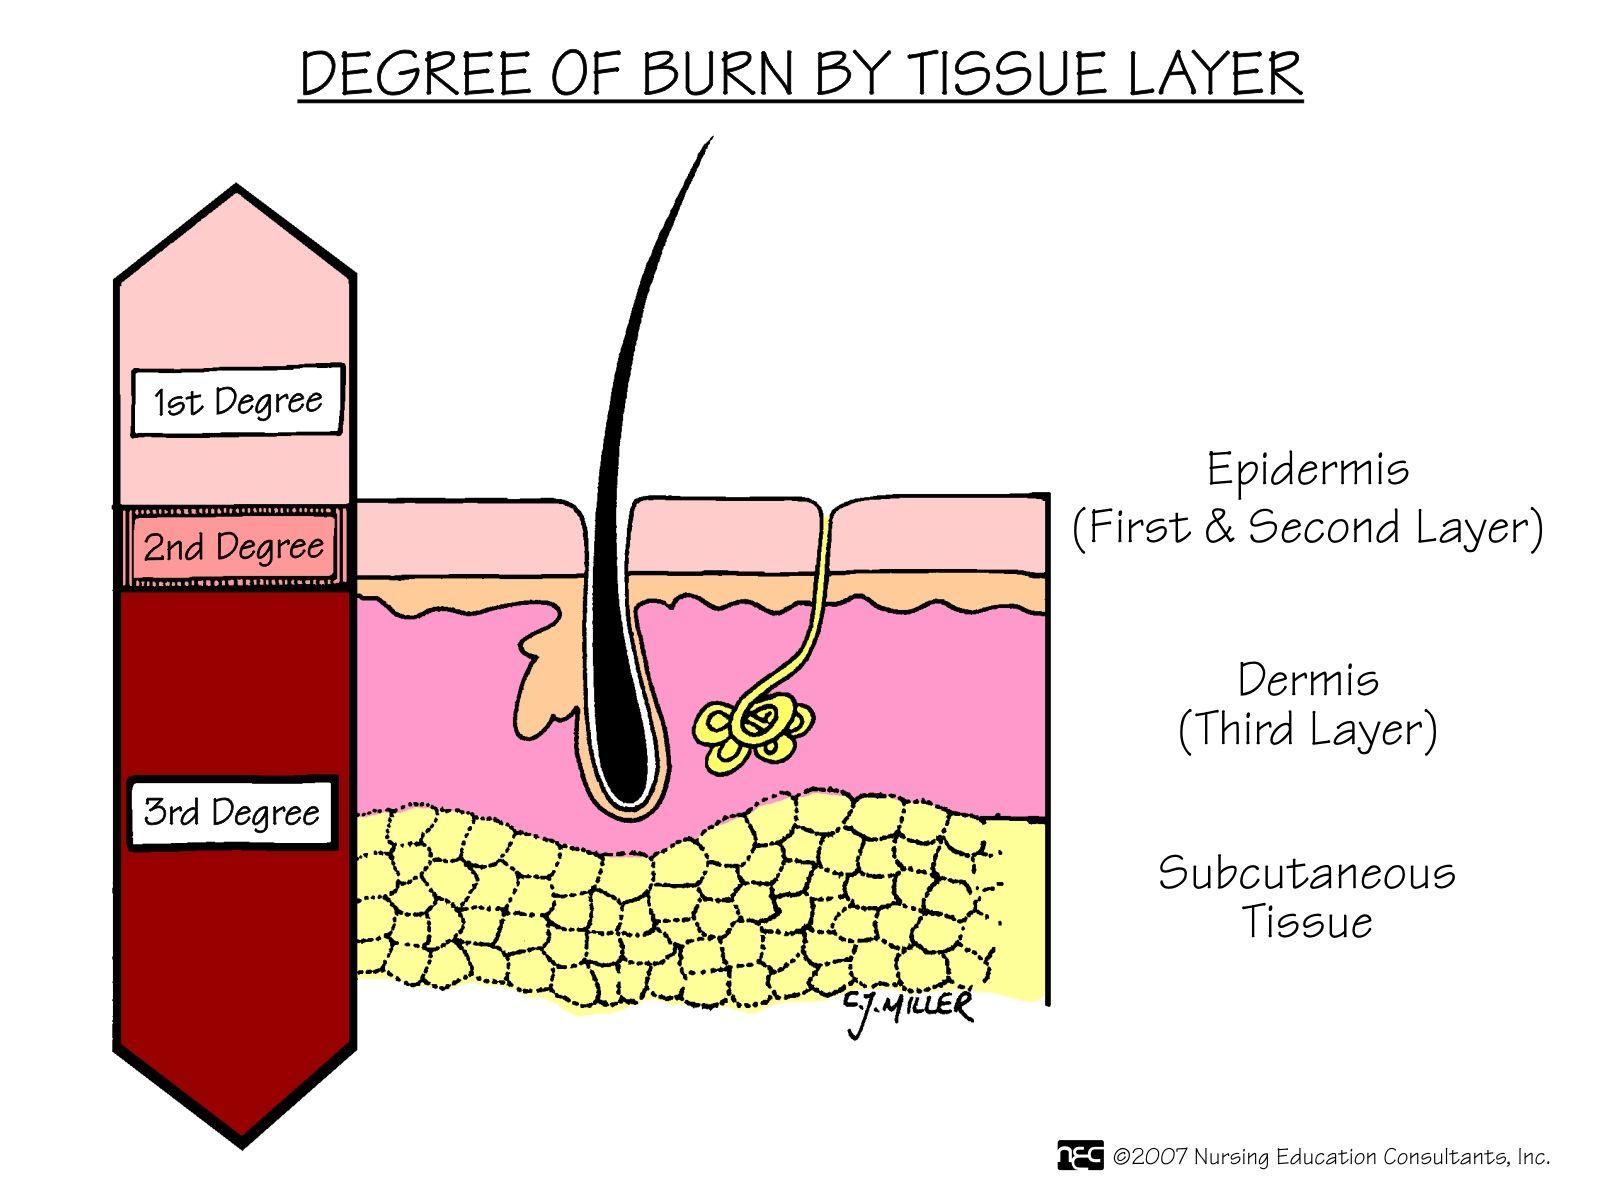 2nd Degree Burn Diagram